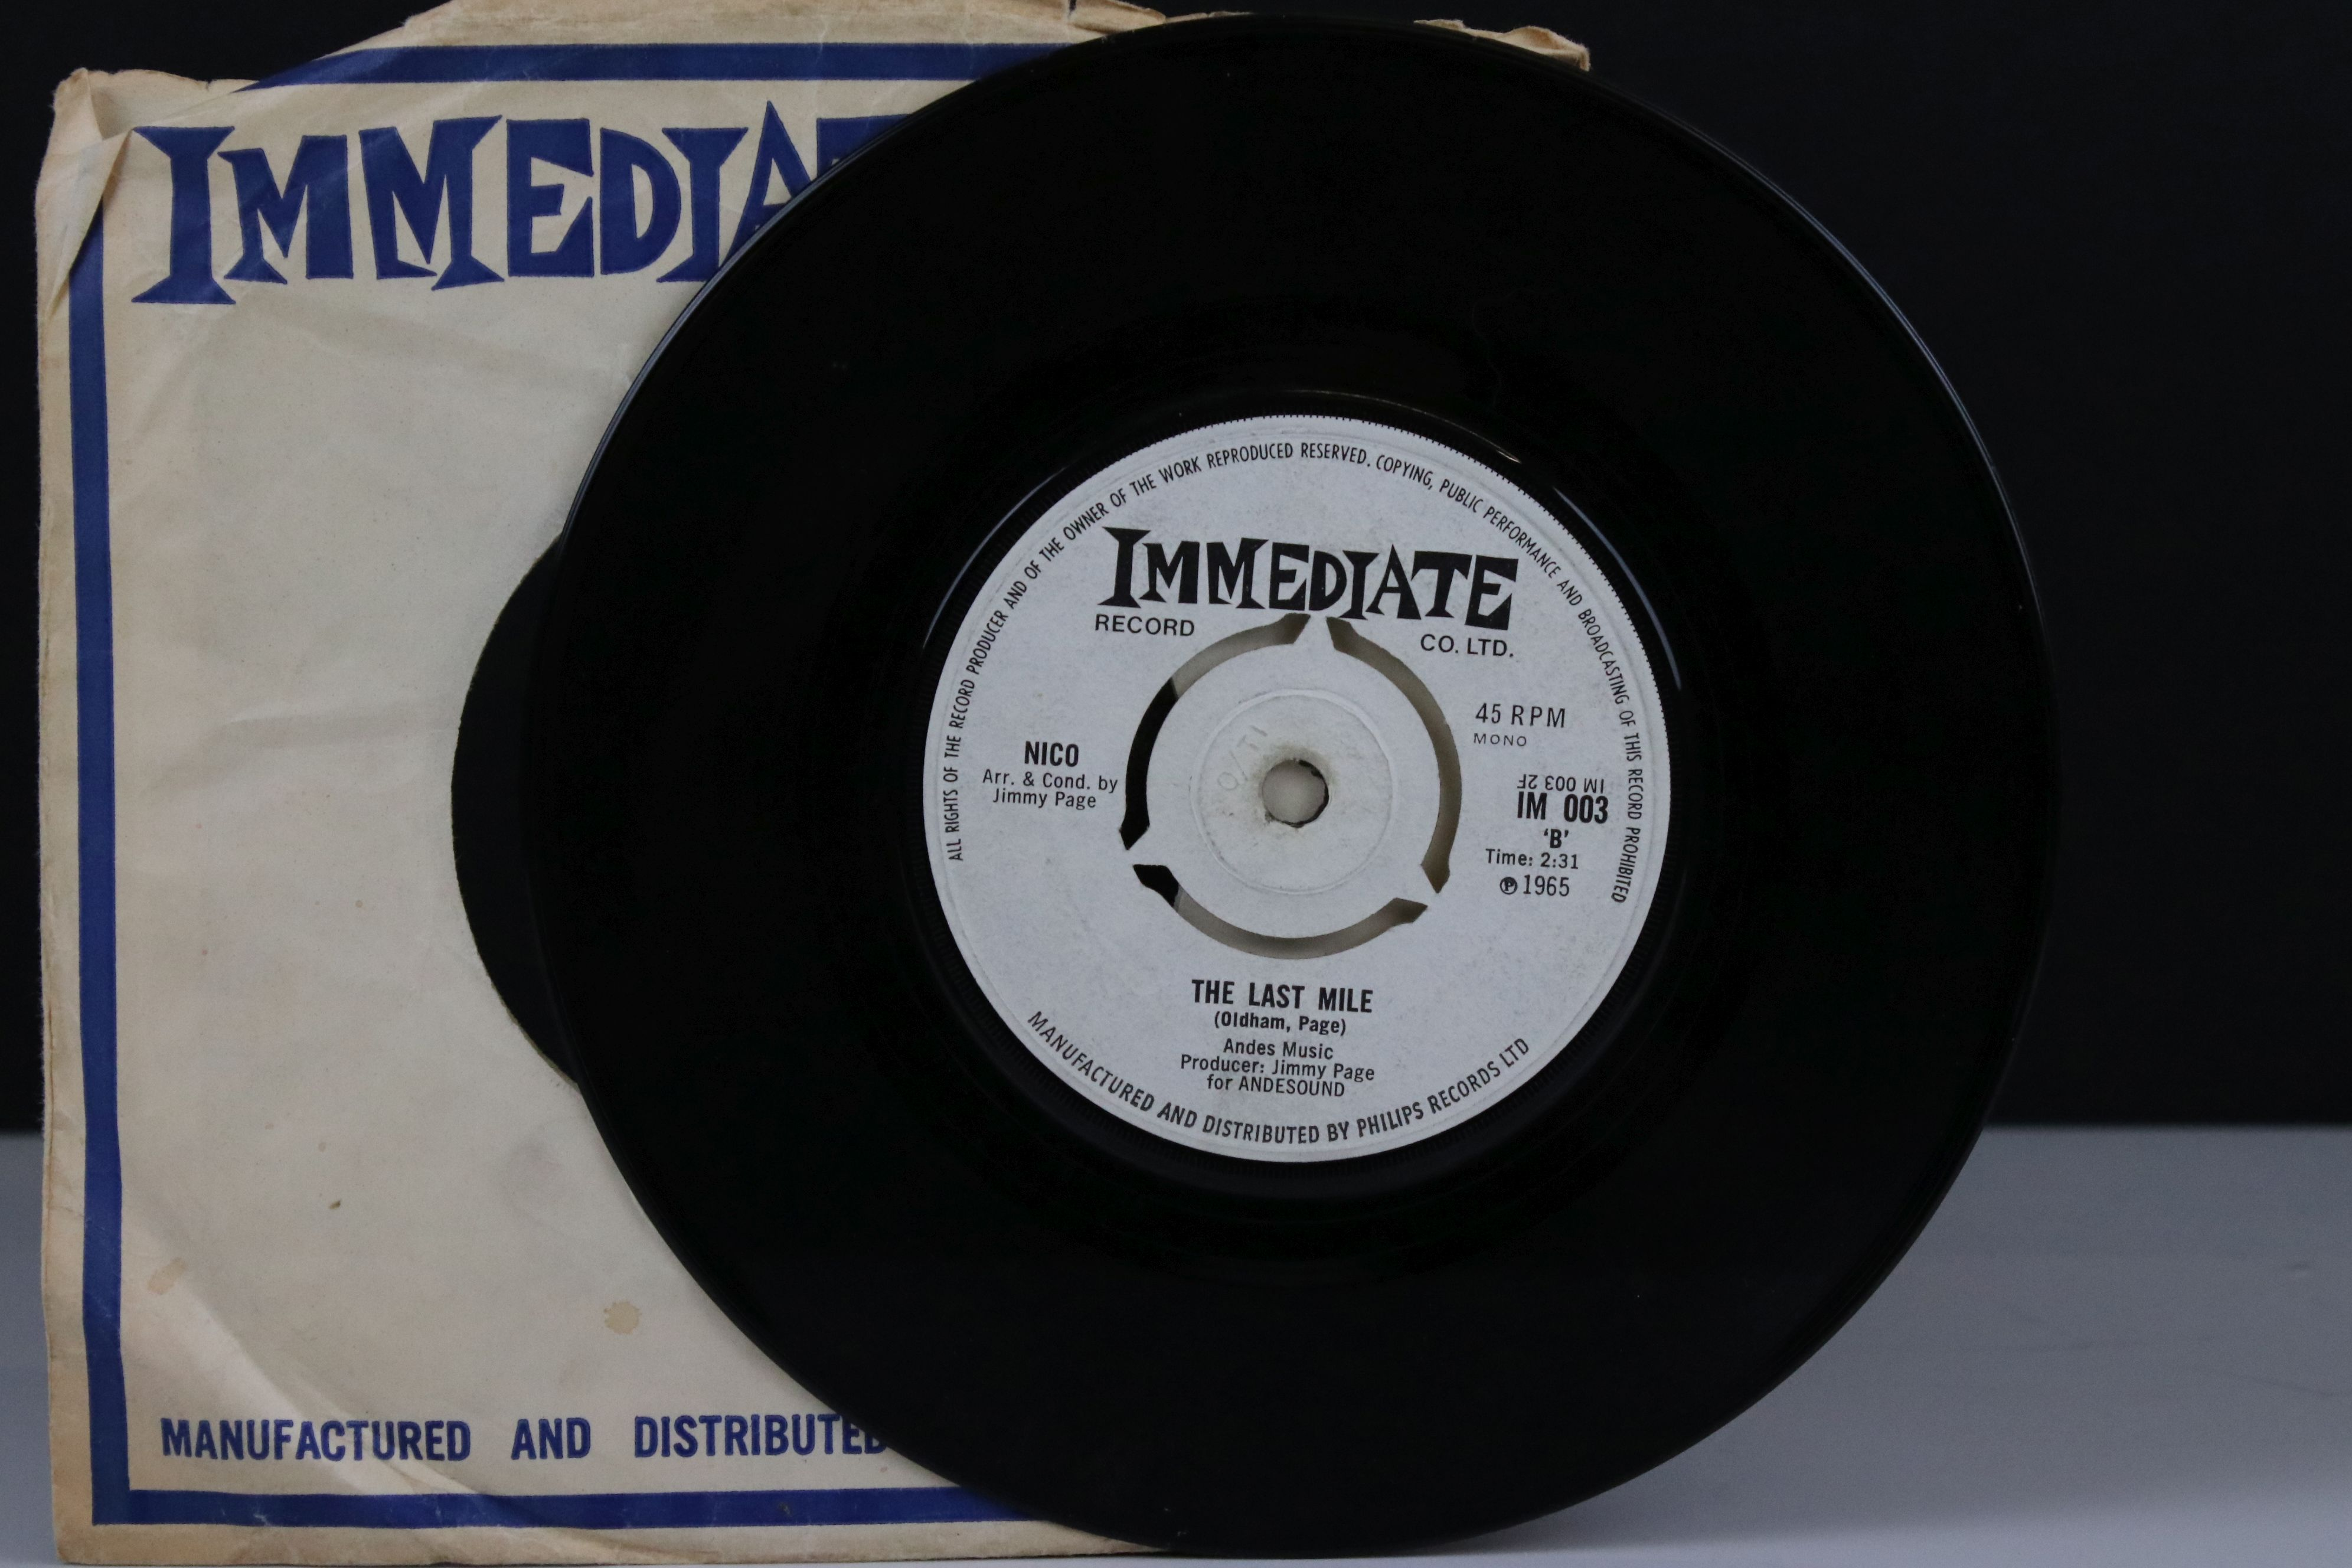 Vinyl - Nico I'm Not Sayin / The Last Mile 45 on Immediate IM003 in company sleeve, vg - Image 3 of 5